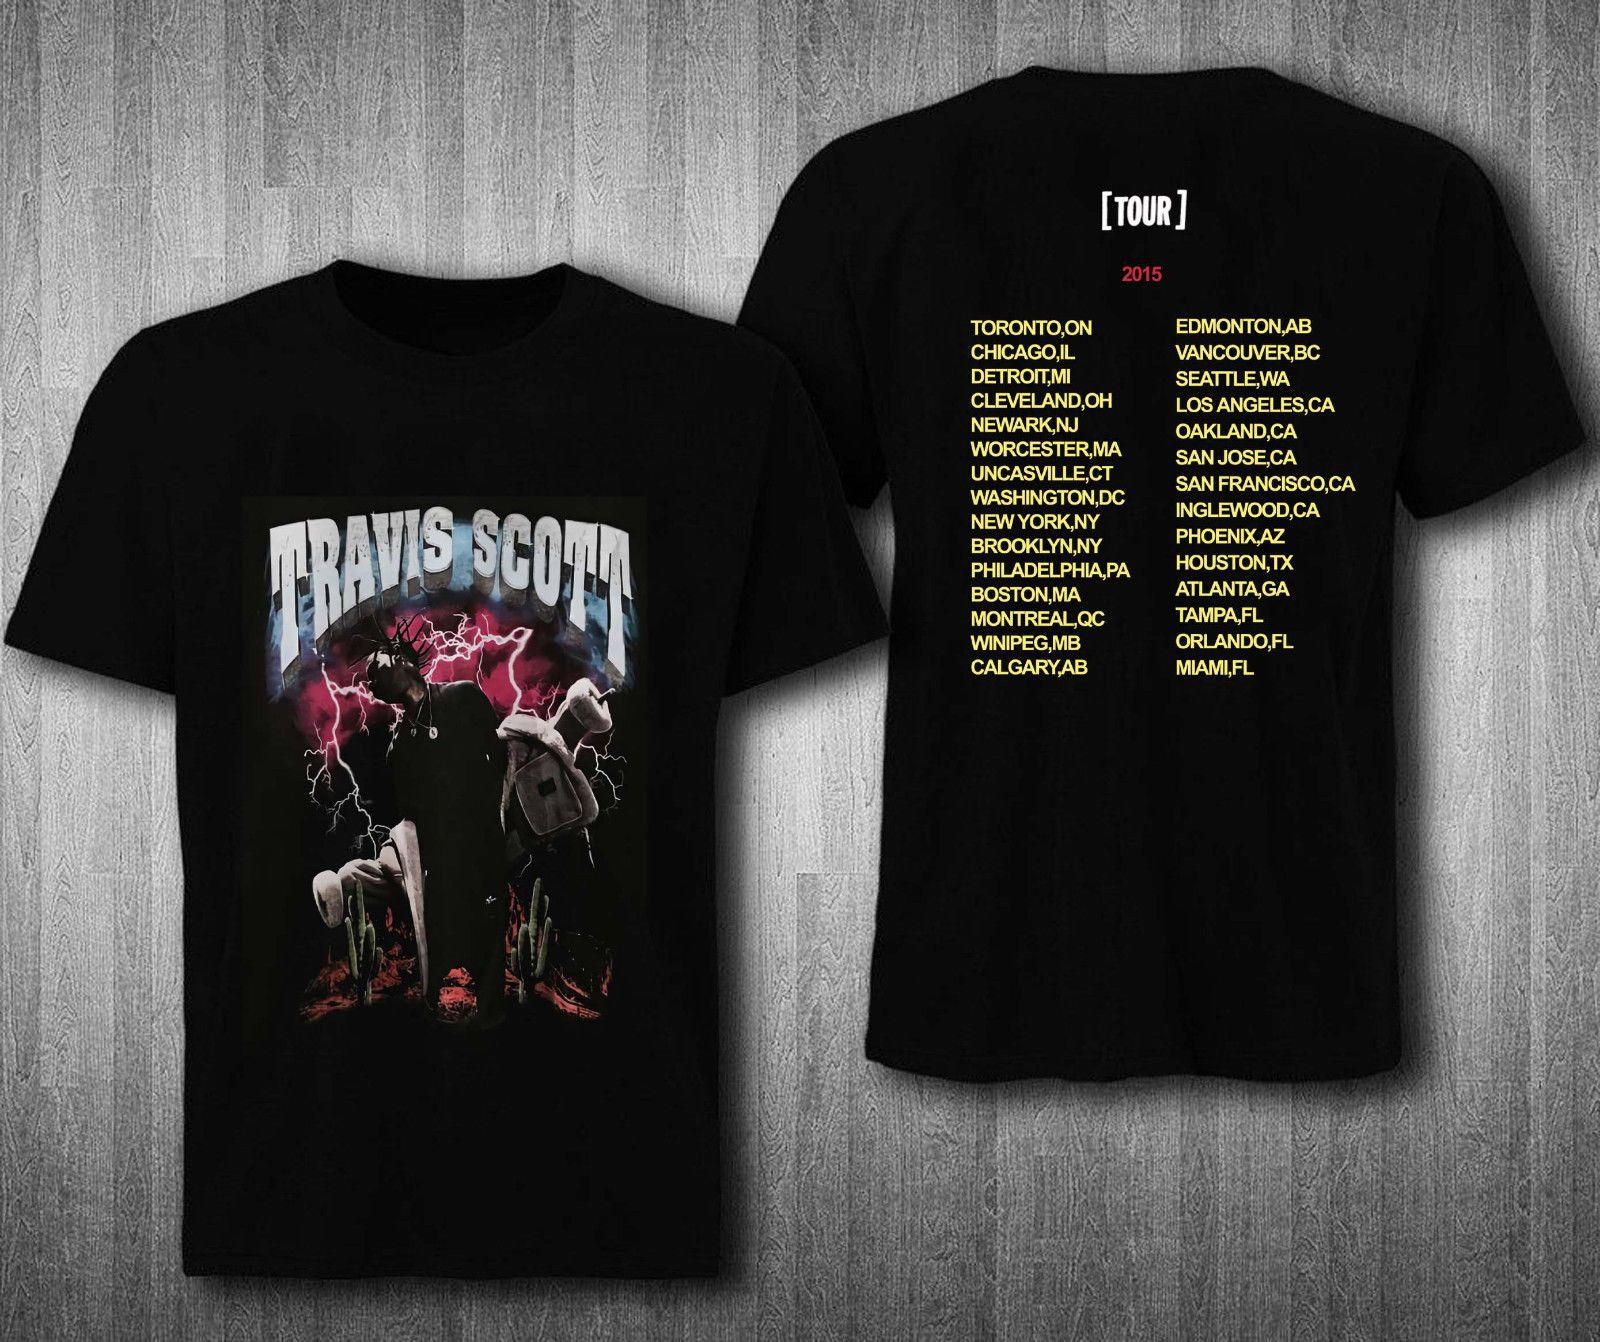 c13969ad9c6c Travis Scott Pen & Pixel T Shirt RODEO MADNESS New Fashion Mens Short  Sleeve T Shirt Cotton T Shirts Make A Tee Shirt Funniest T Shirts From  Baishi2, ...